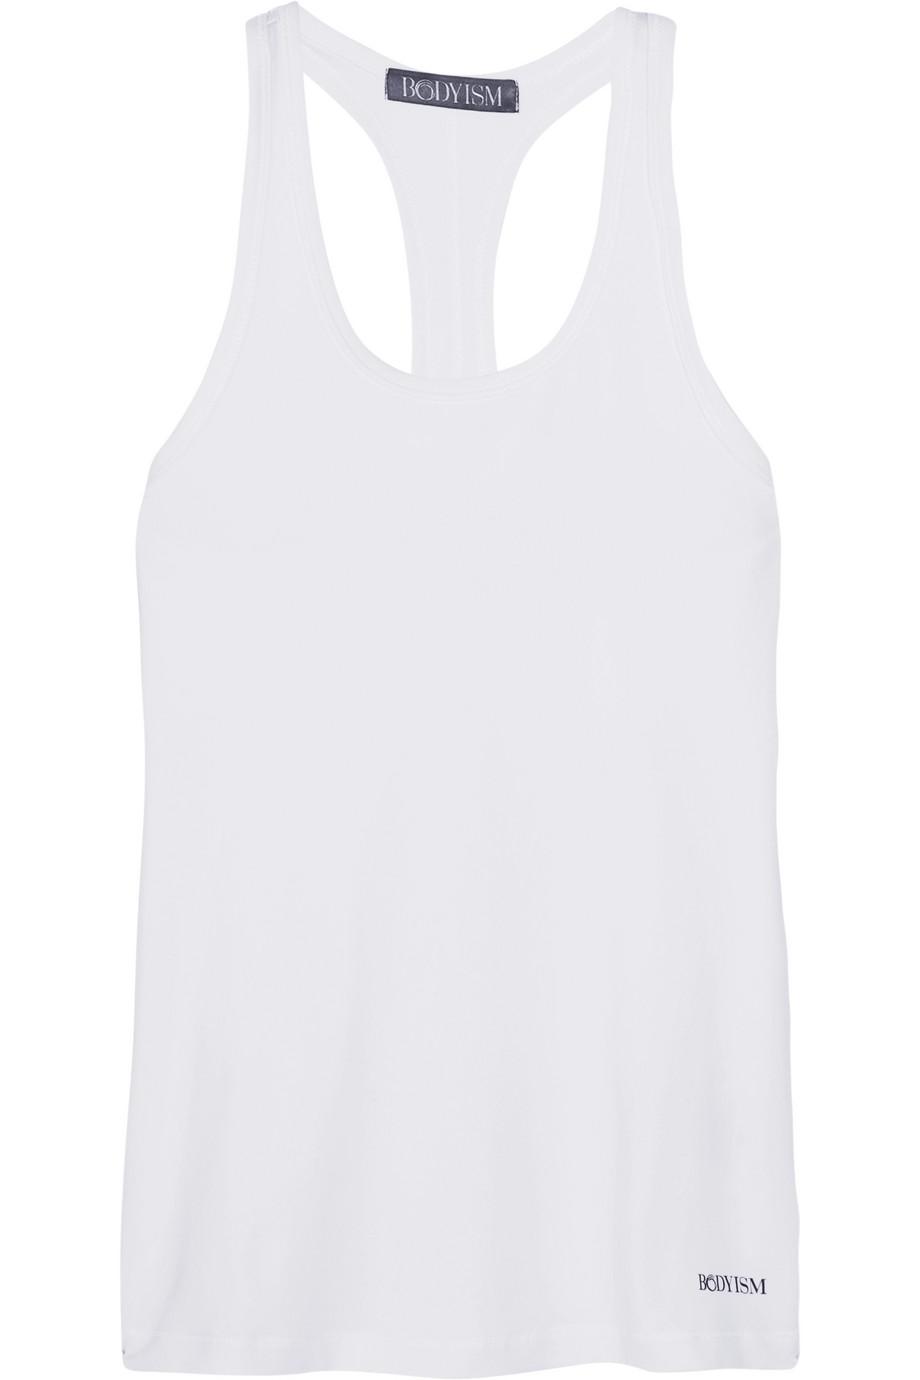 Bodyism Daniella Racer-Back Stretch-Jersey Tank, White, Women's